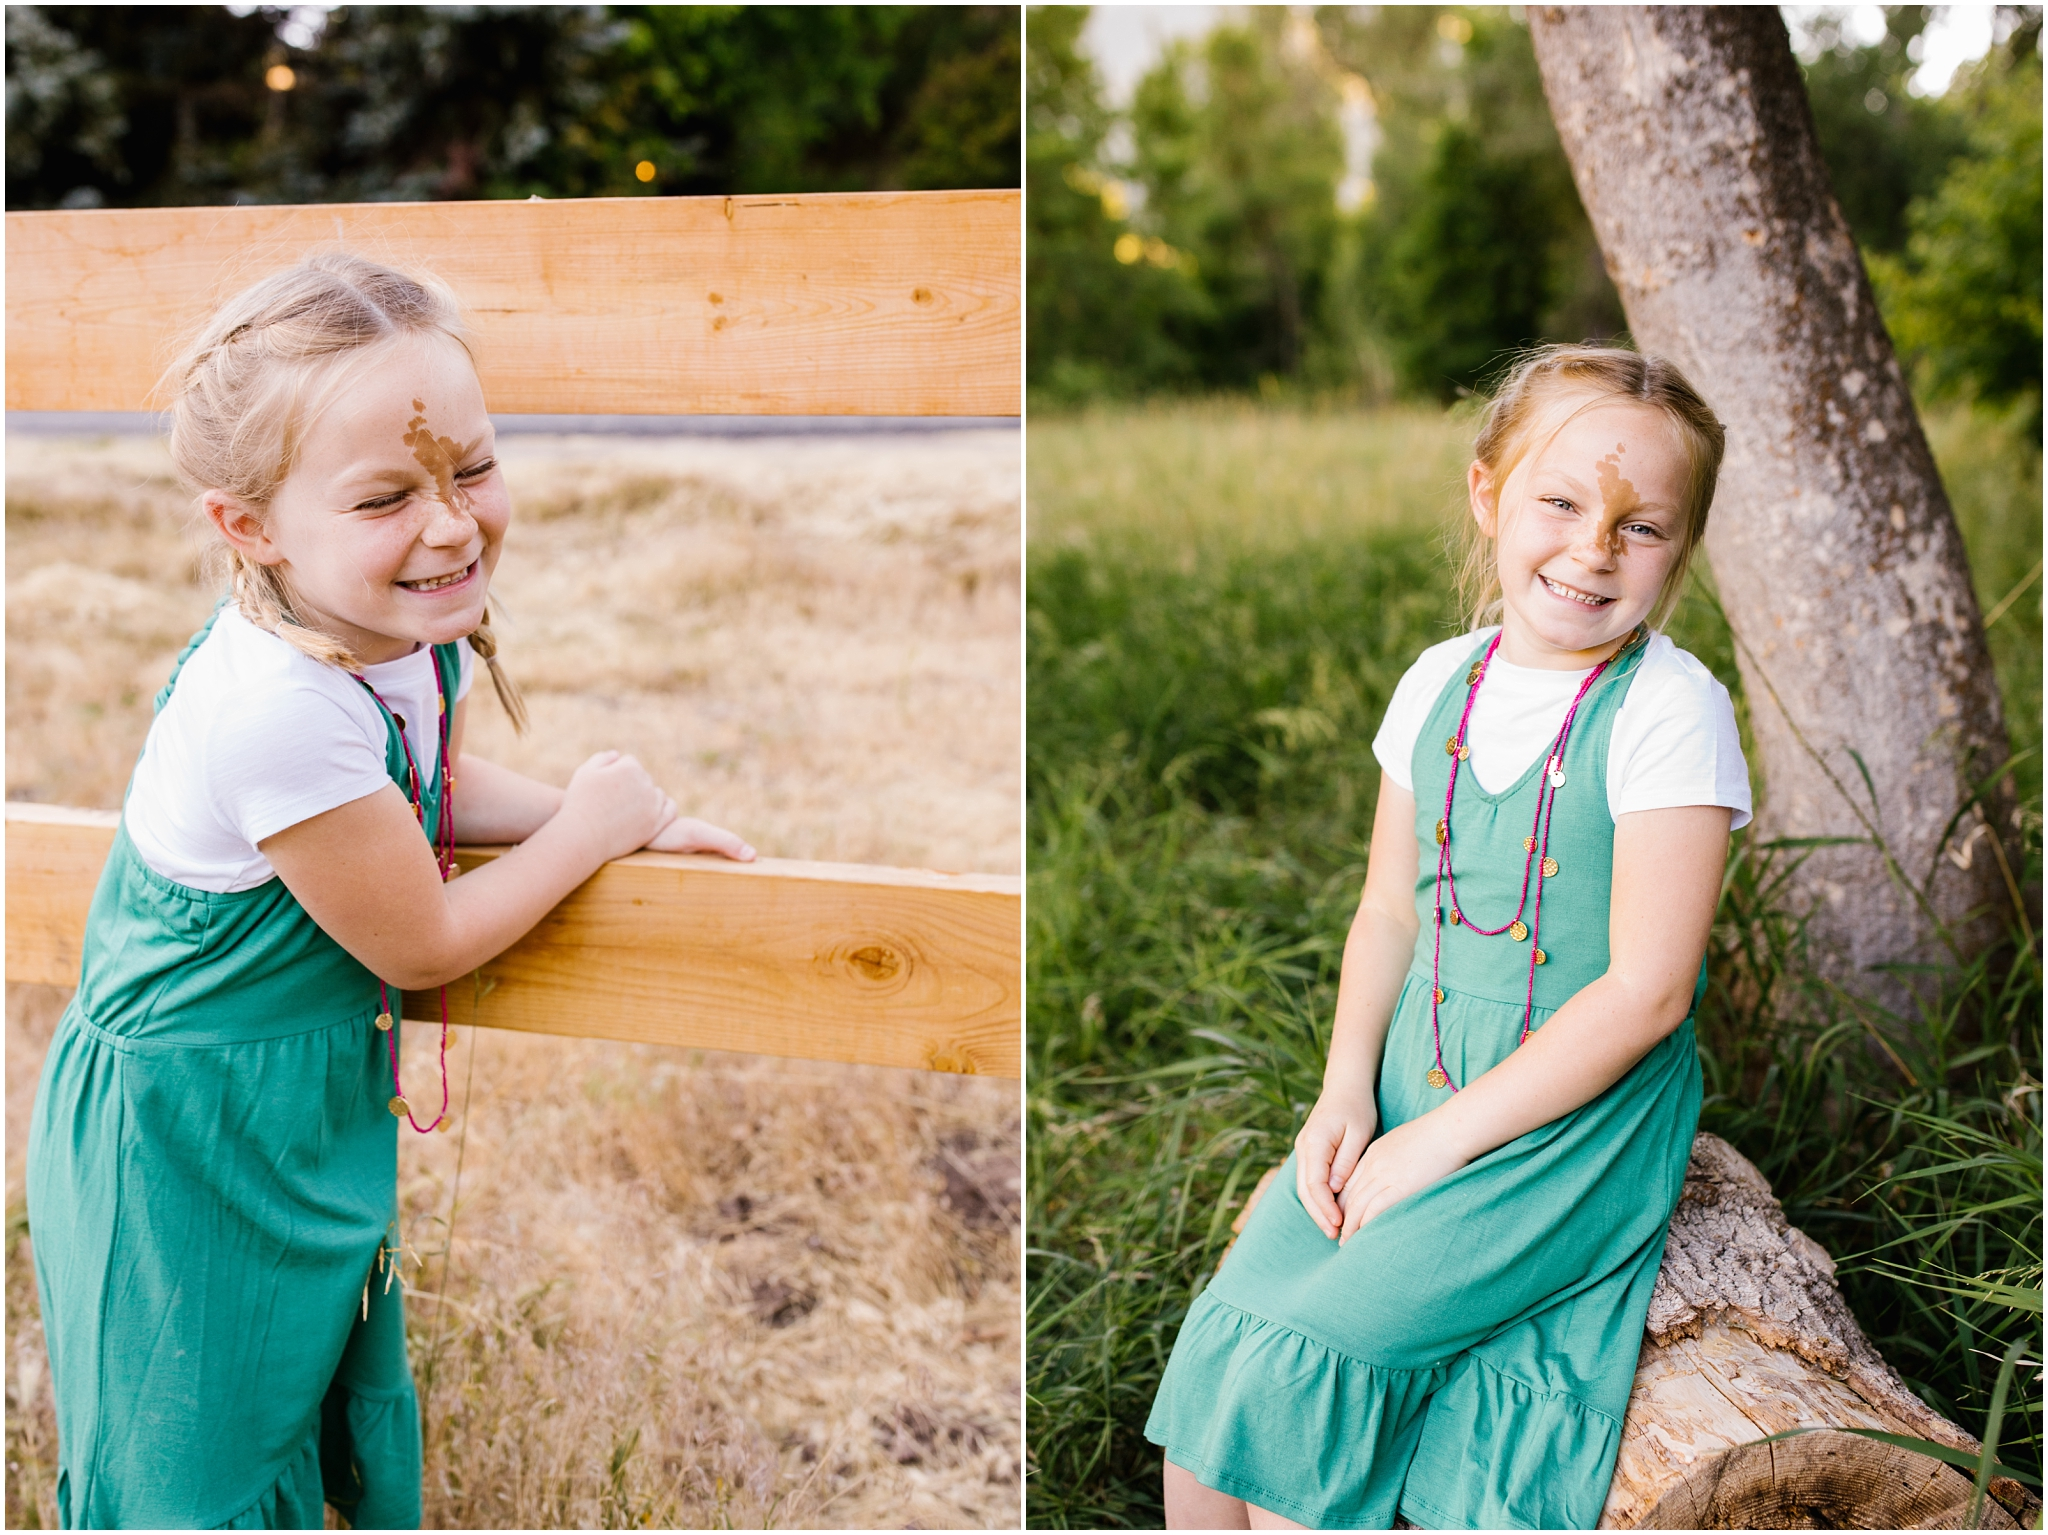 Lizzie-B-Imagery-Utah-Family-Photographer-Utah-County-Photographer-Hobble-Creek-Canyon_0011.jpg